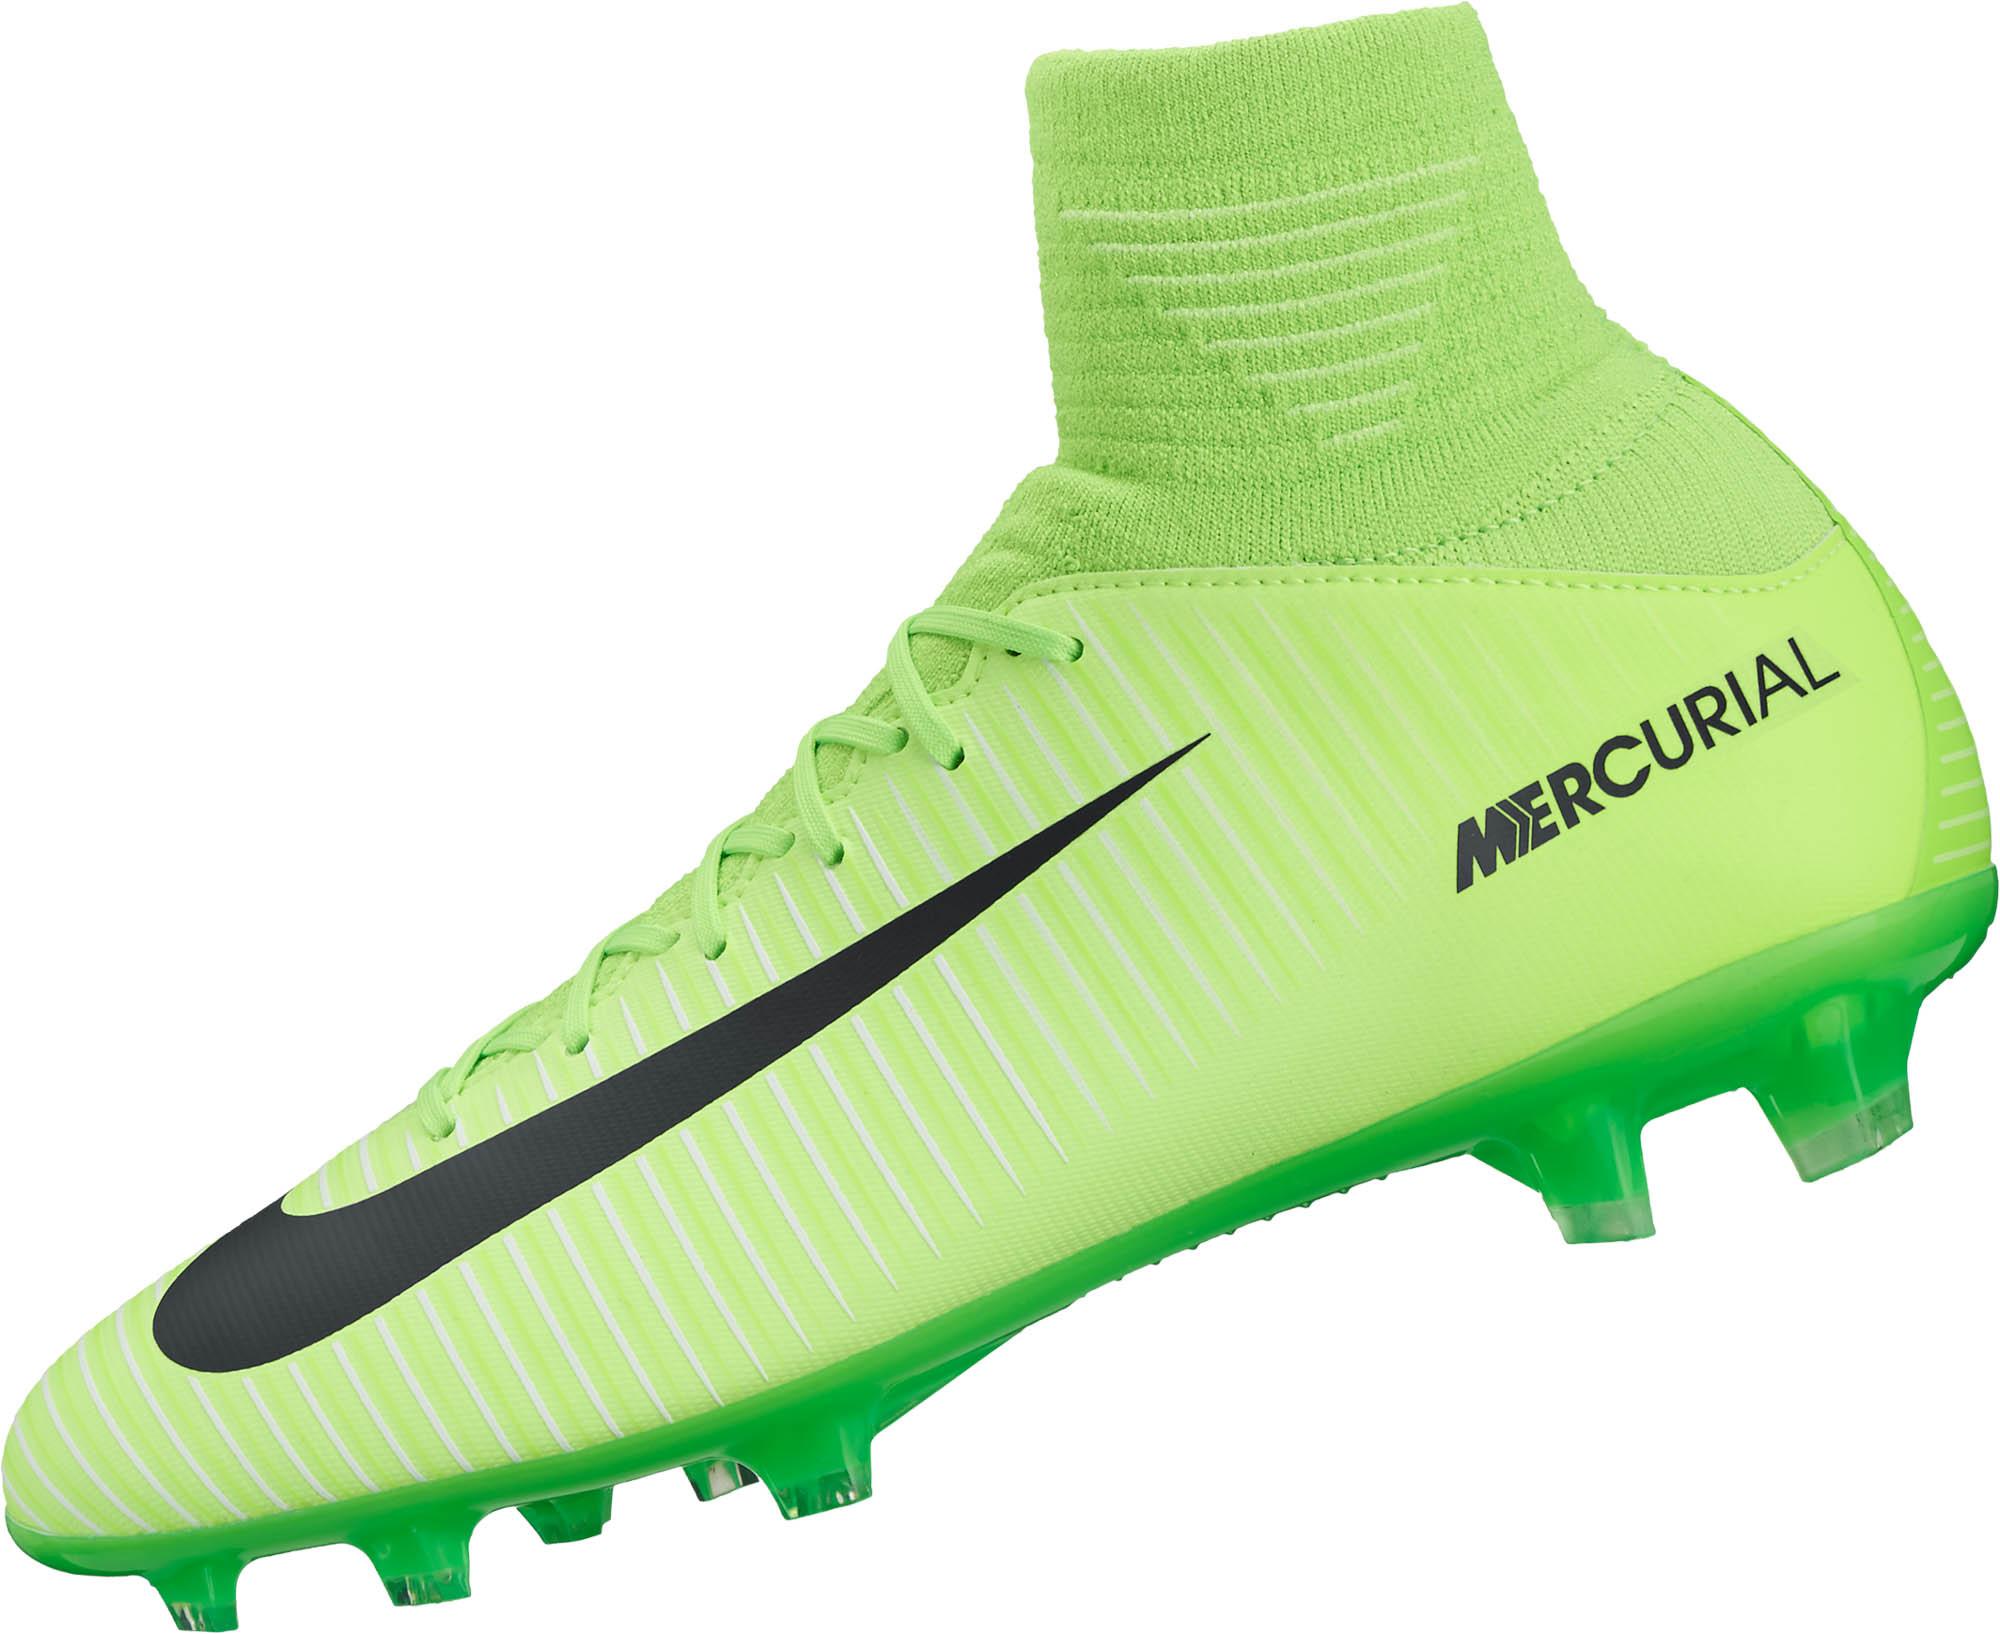 b7997b9cc Nike Kids Mercurial Superfly V FG – Electric Green Flash Lime